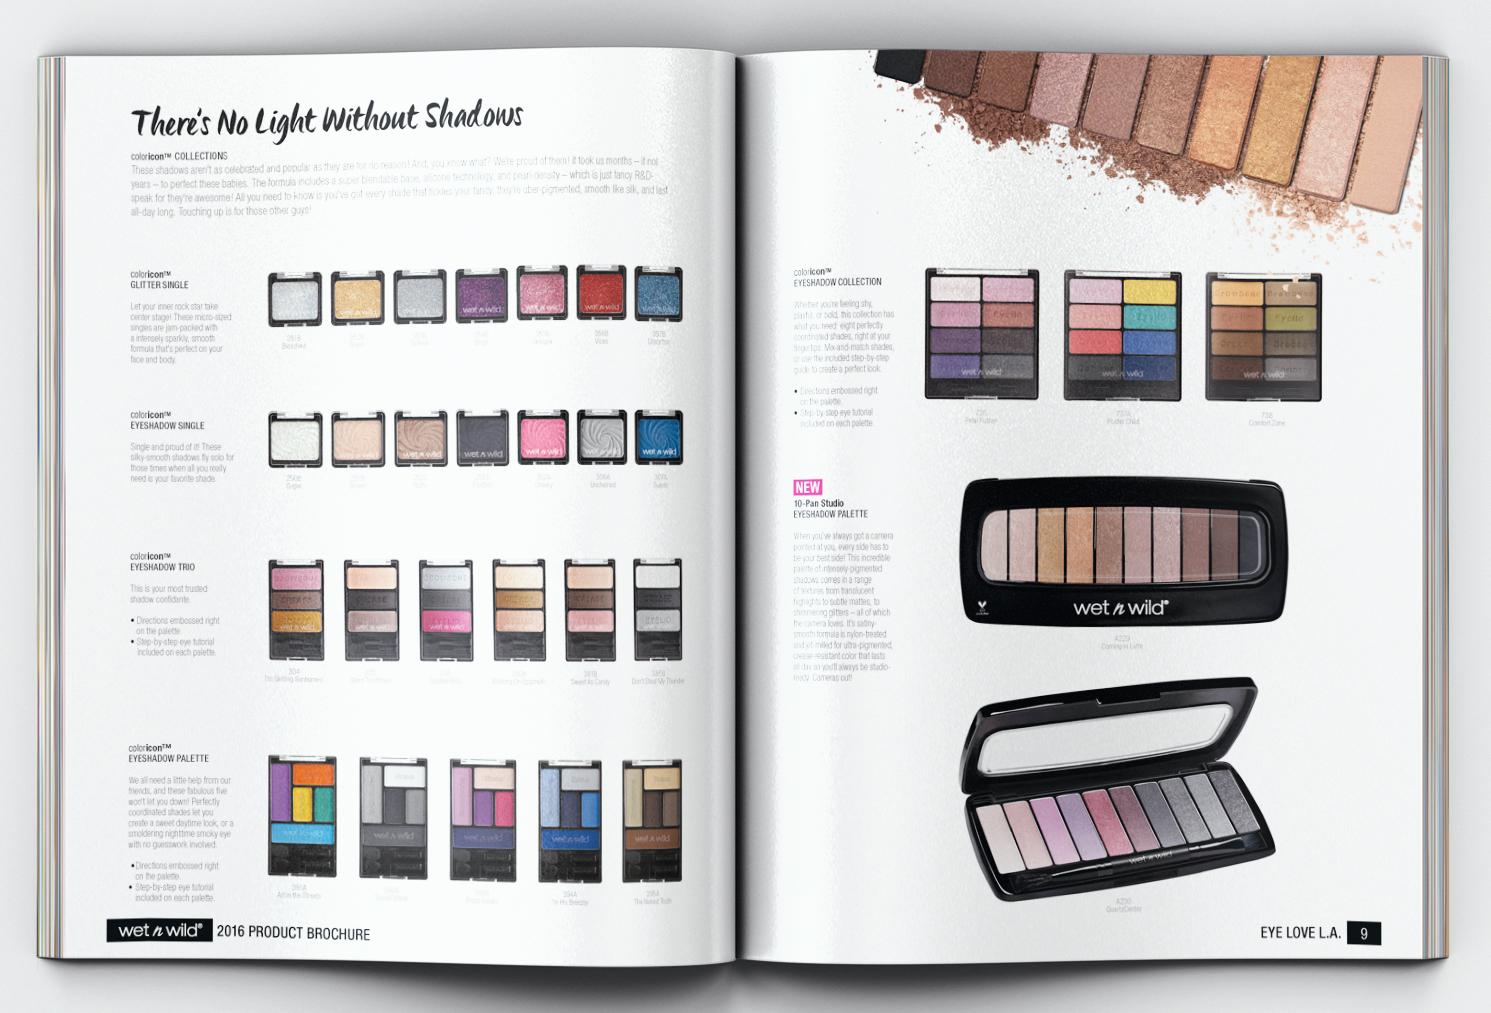 Natl_Product_Brochure_05.jpg